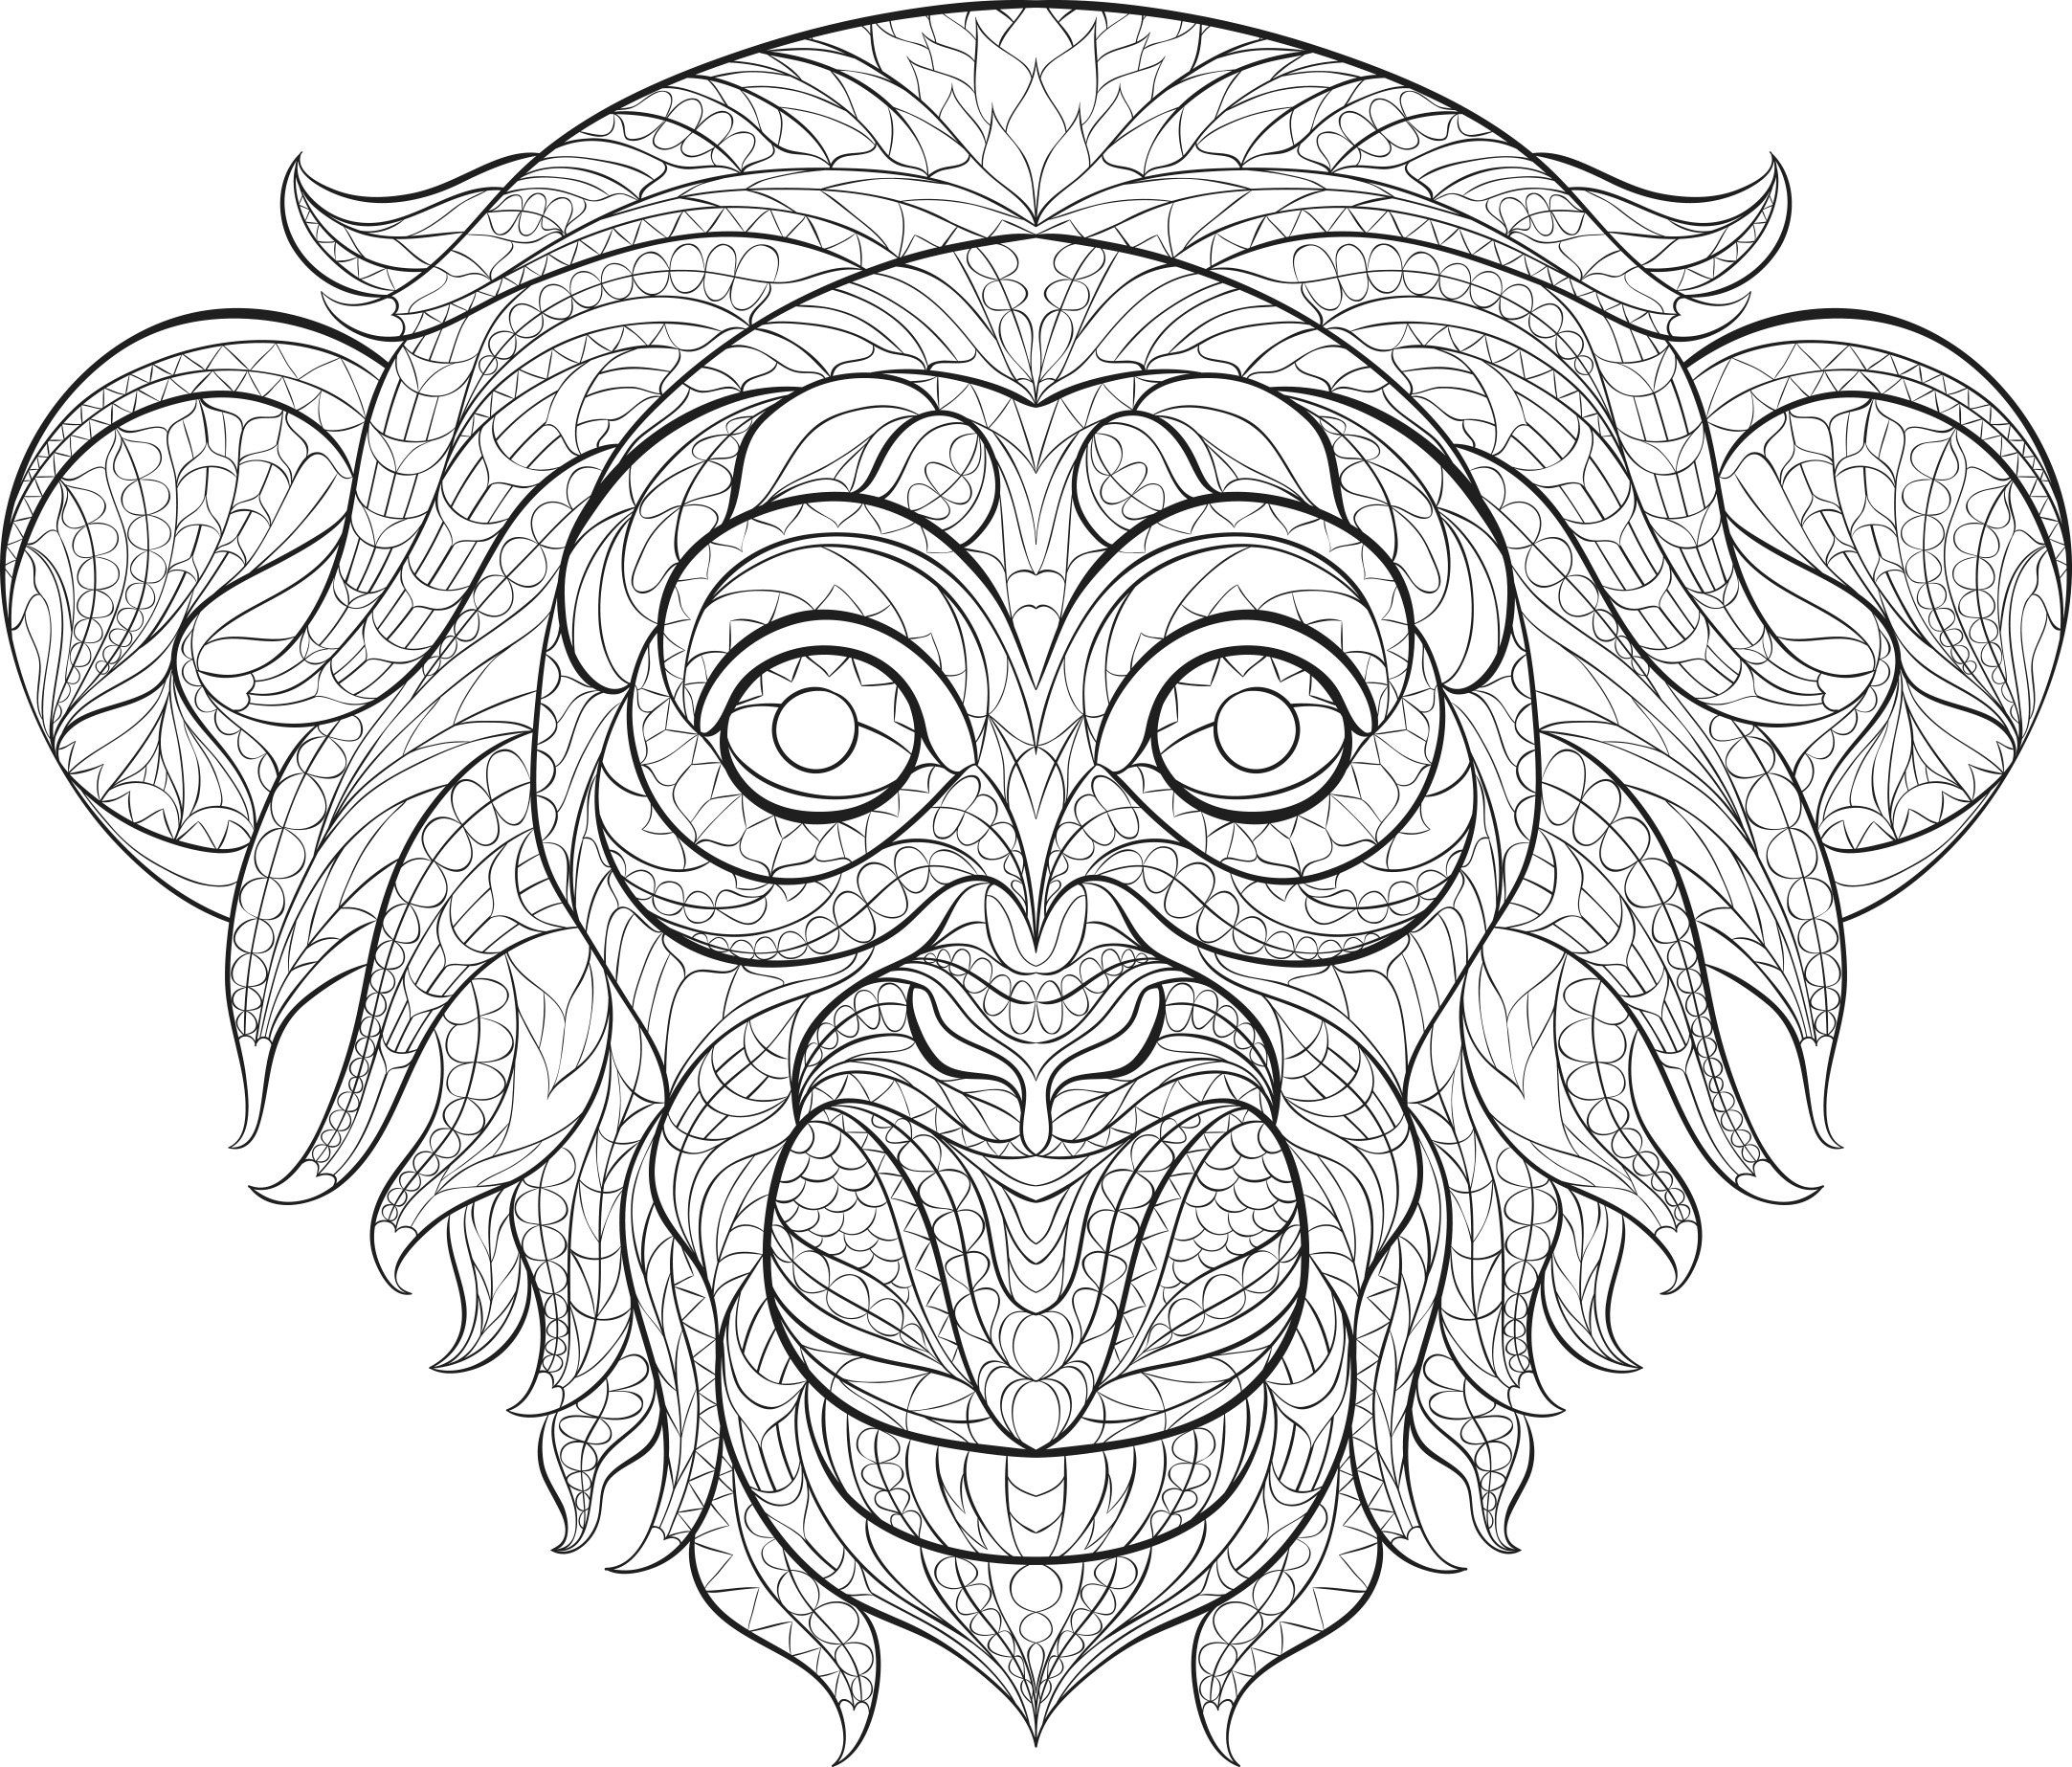 2165x1846 Stress Less Animals Adams Media Monkey Color Me Fun